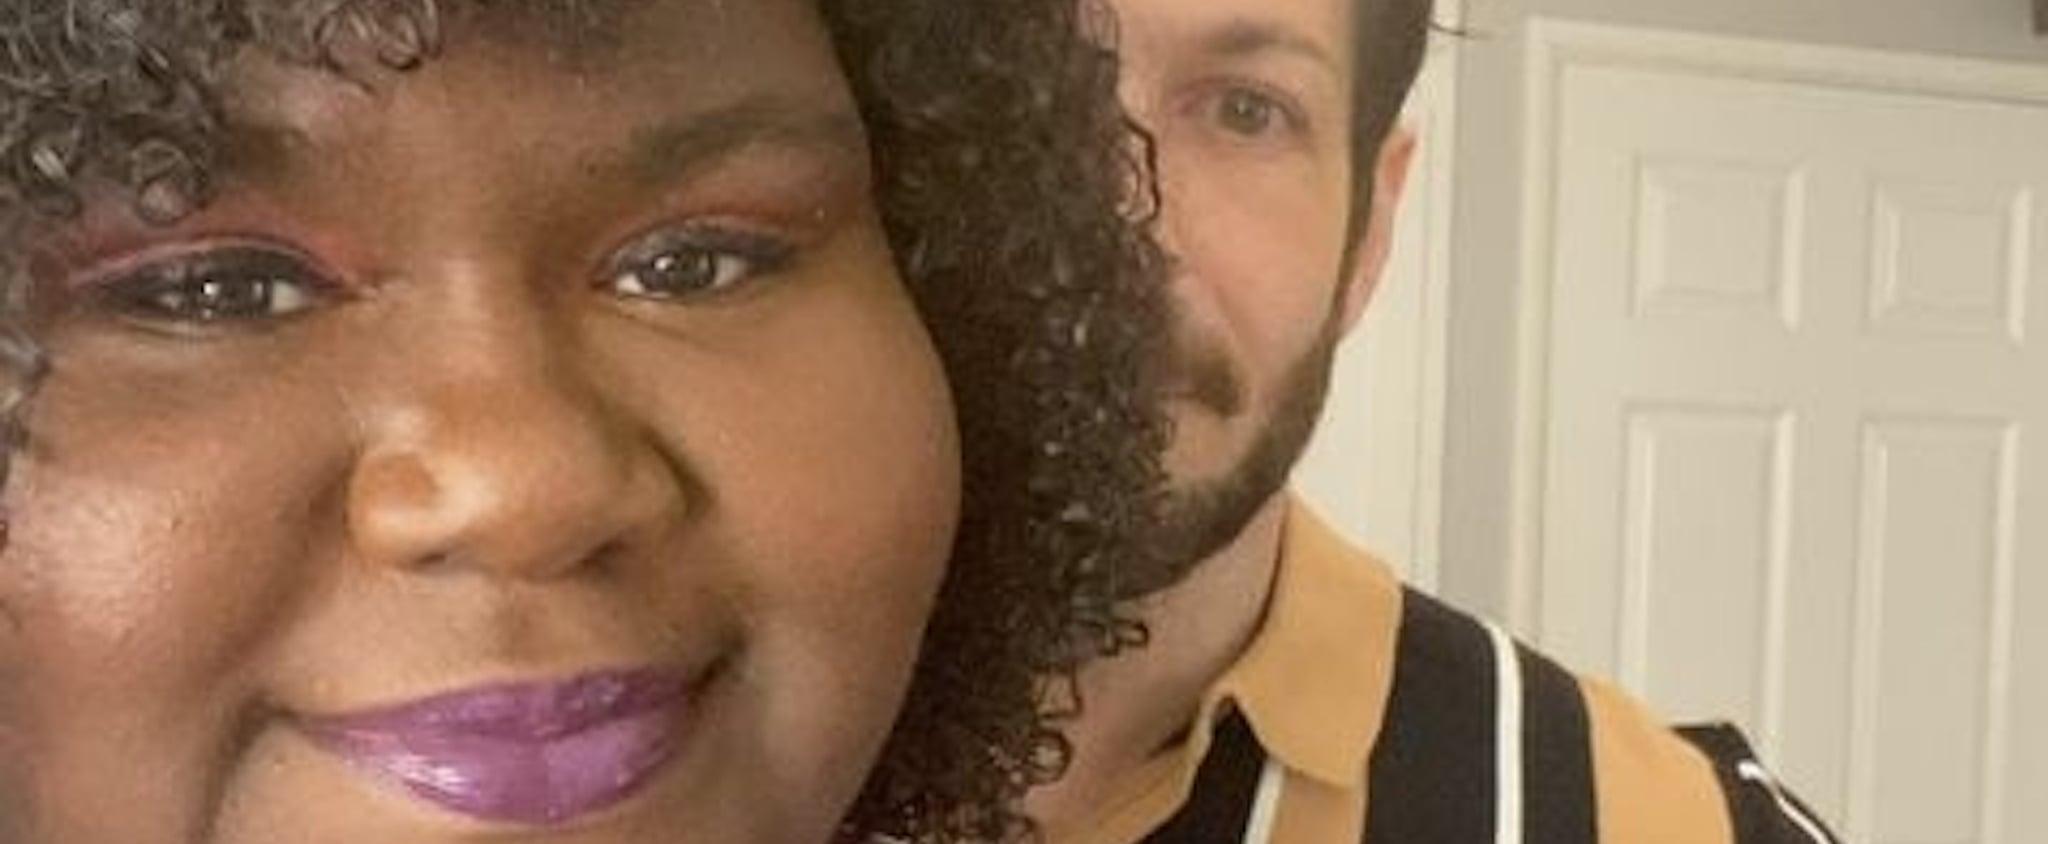 Gabourey Sidibe Is Engaged to Boyfriend Brandon Frankel